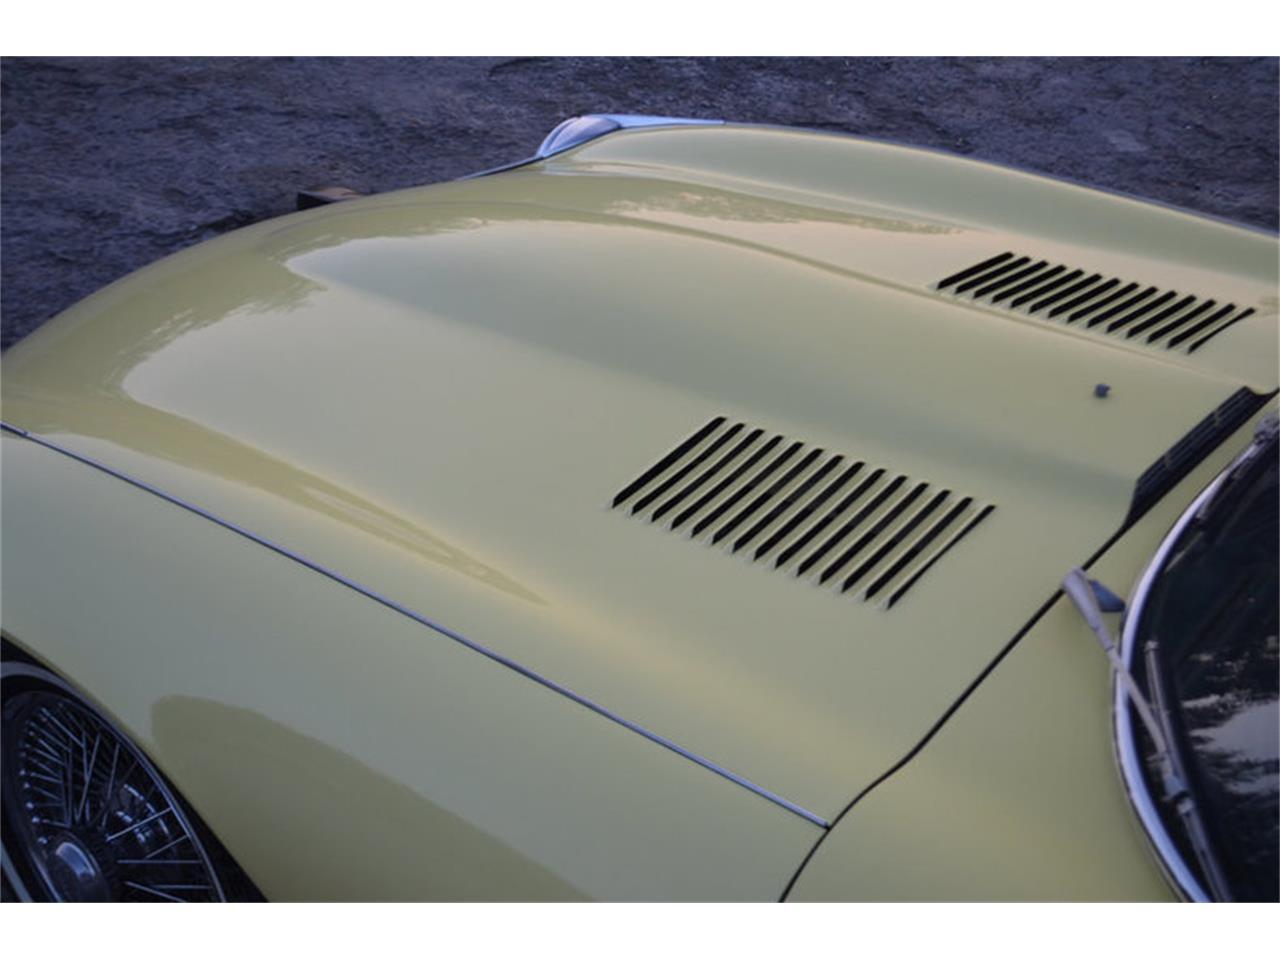 Large Picture of '74 Jaguar XKE - $68,800.00 Offered by Frazier Motor Car Company - MEJG